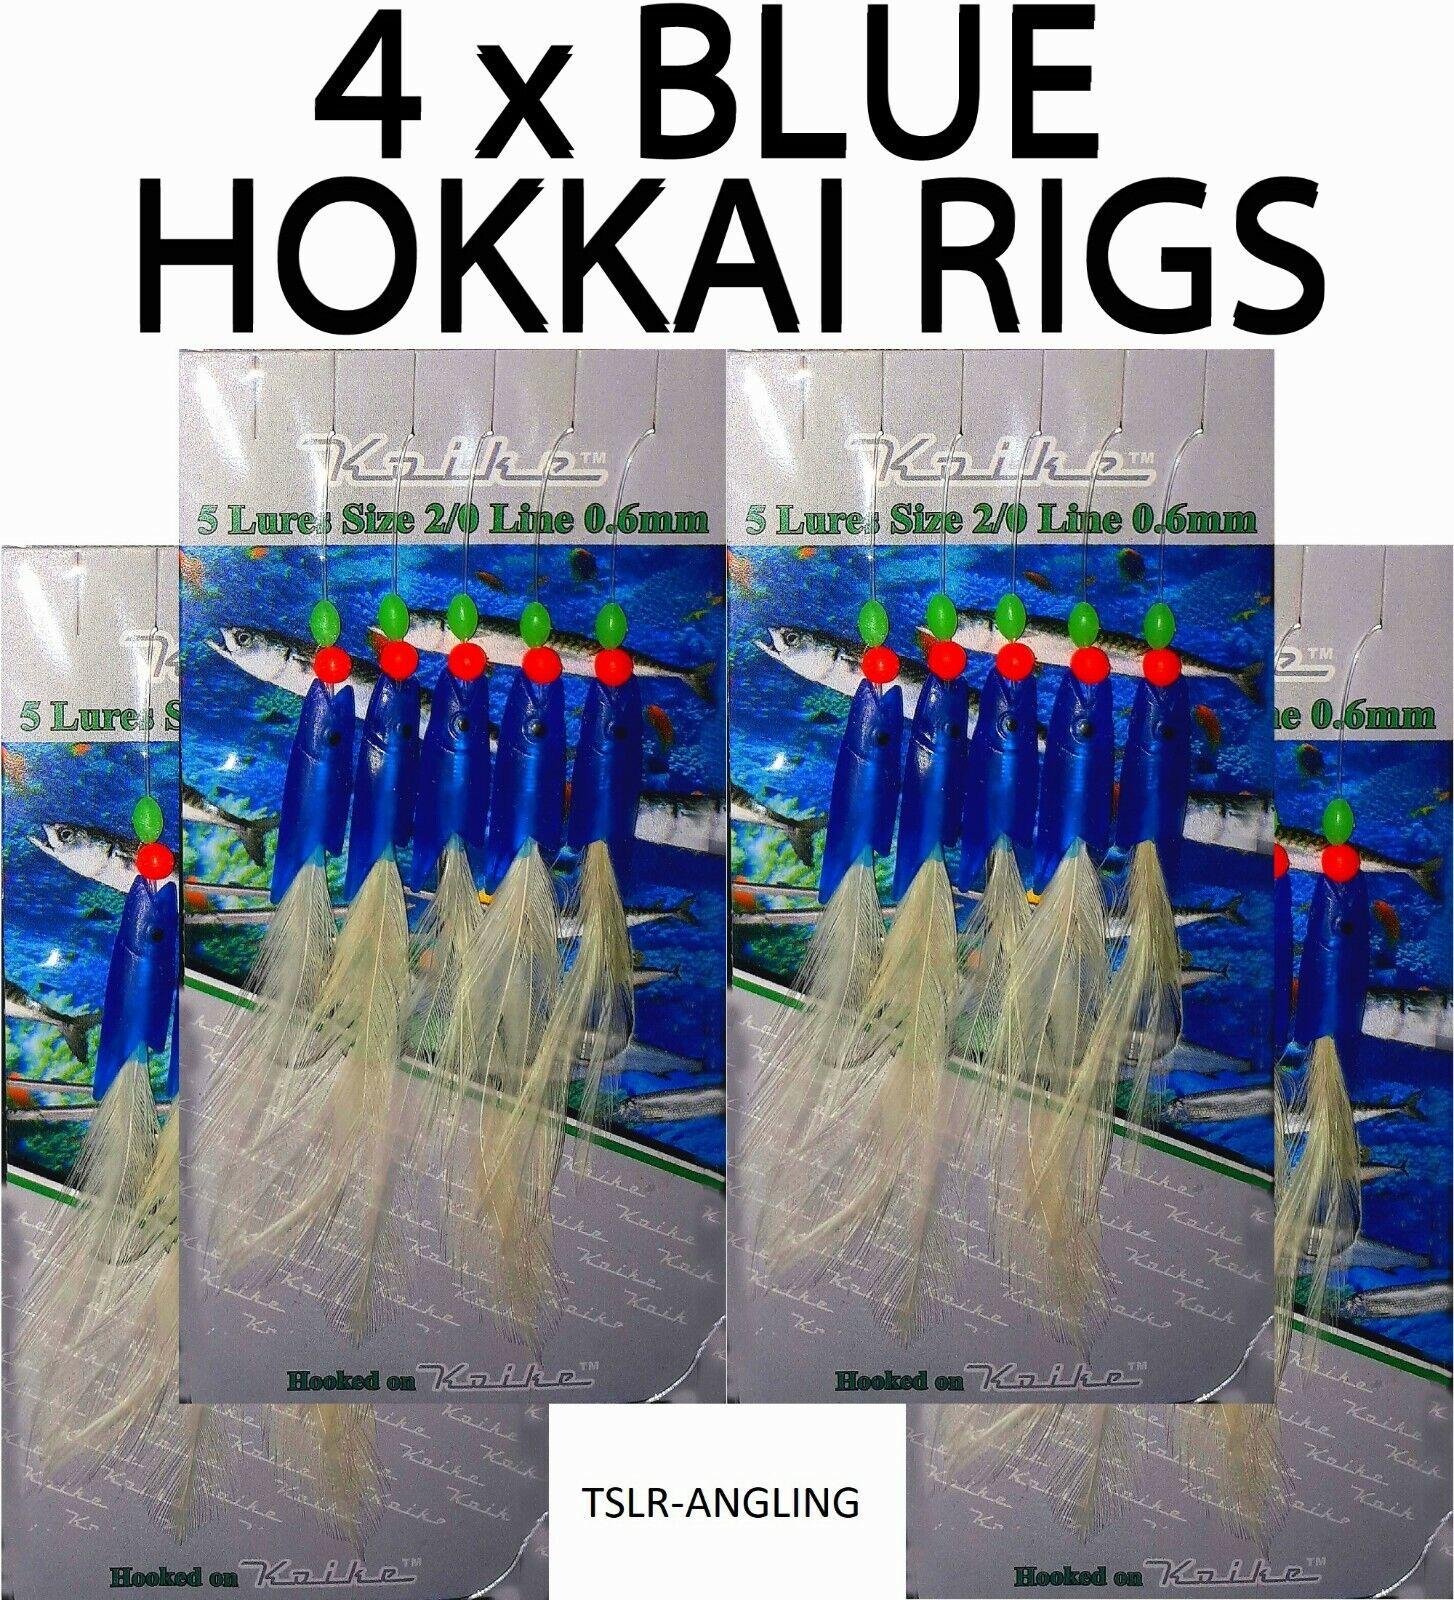 COD POLLOCK MACKEREL RIGS BLUE HOKKAI RIG SEA FISHING TACKLE LURES